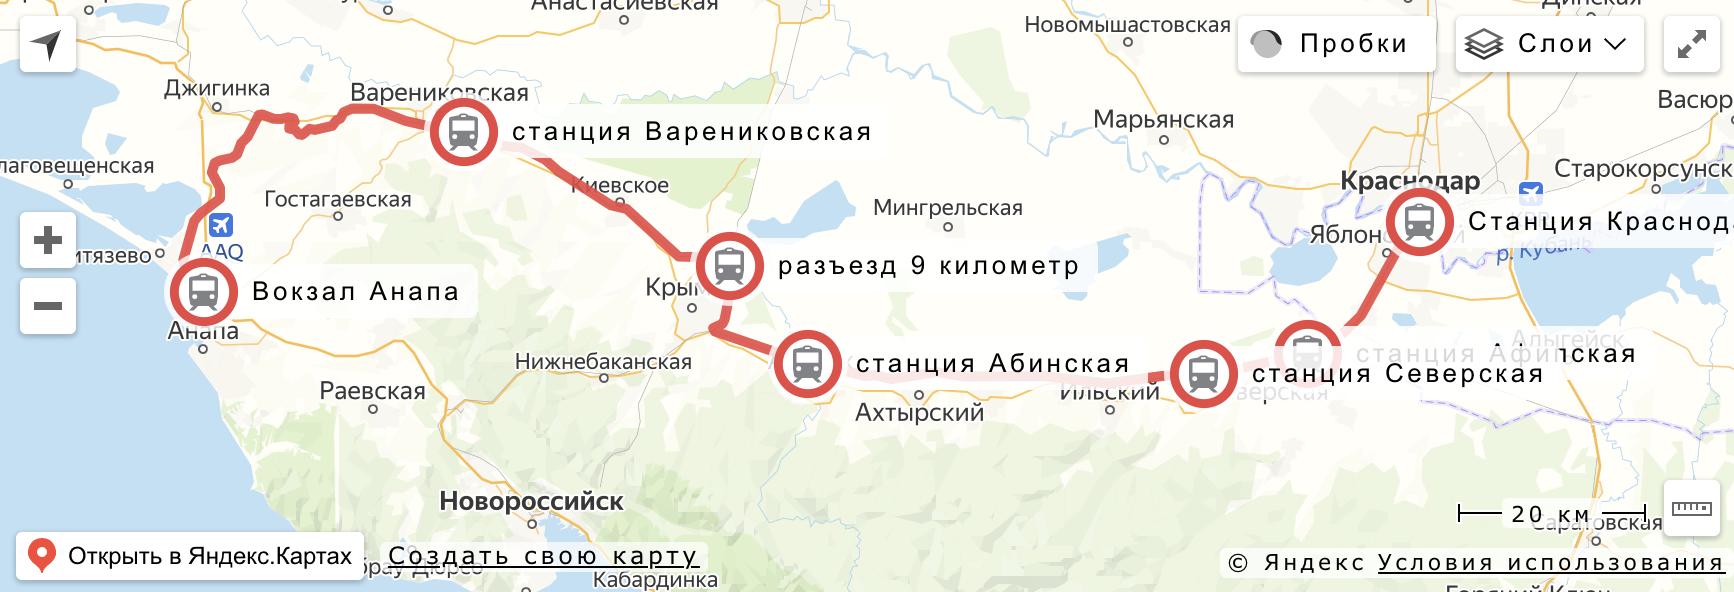 "Маршрут поезда ""Ласточка"" Анапа - Краснодар"